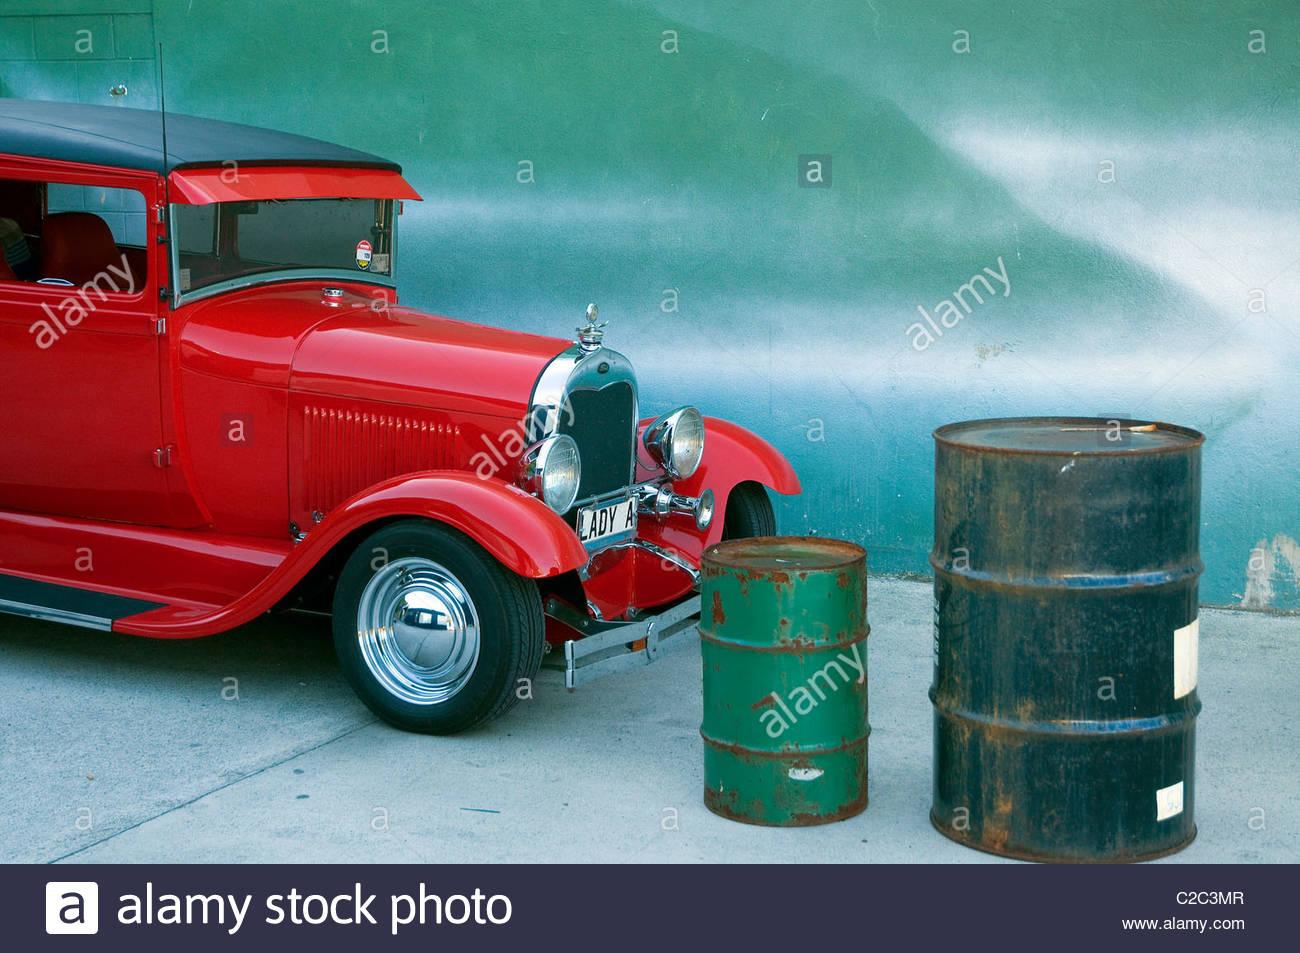 Ein Oldtimer an einer Tankstelle. Stockbild